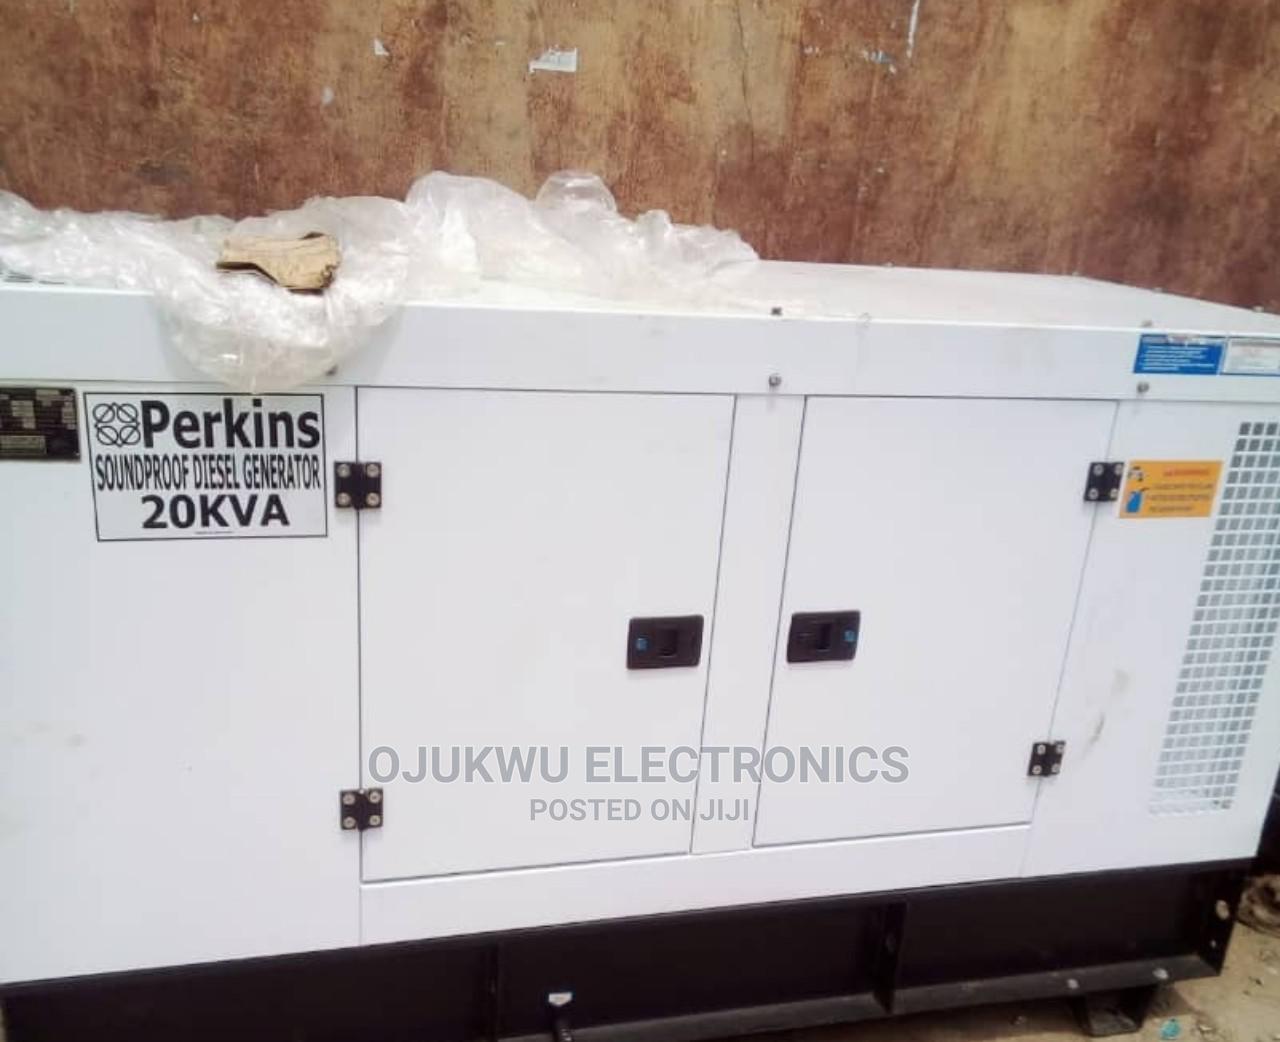 20kva Perkins Soundproof DIESEL Generator 100%Coppa